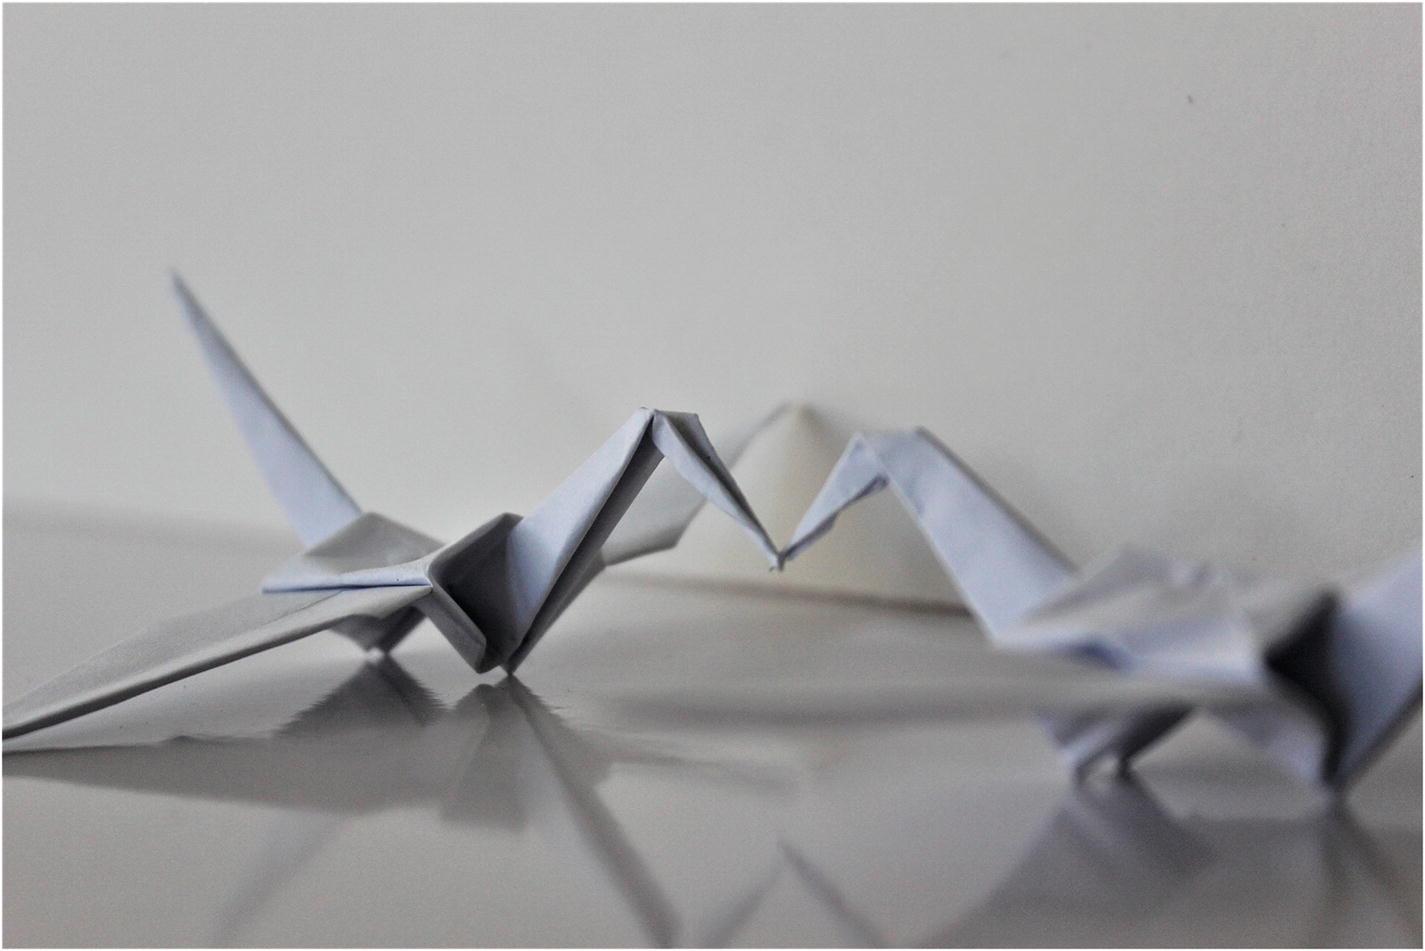 Origami Crane | Origami paper crane, Origami crane tutorial ... | 951x1425